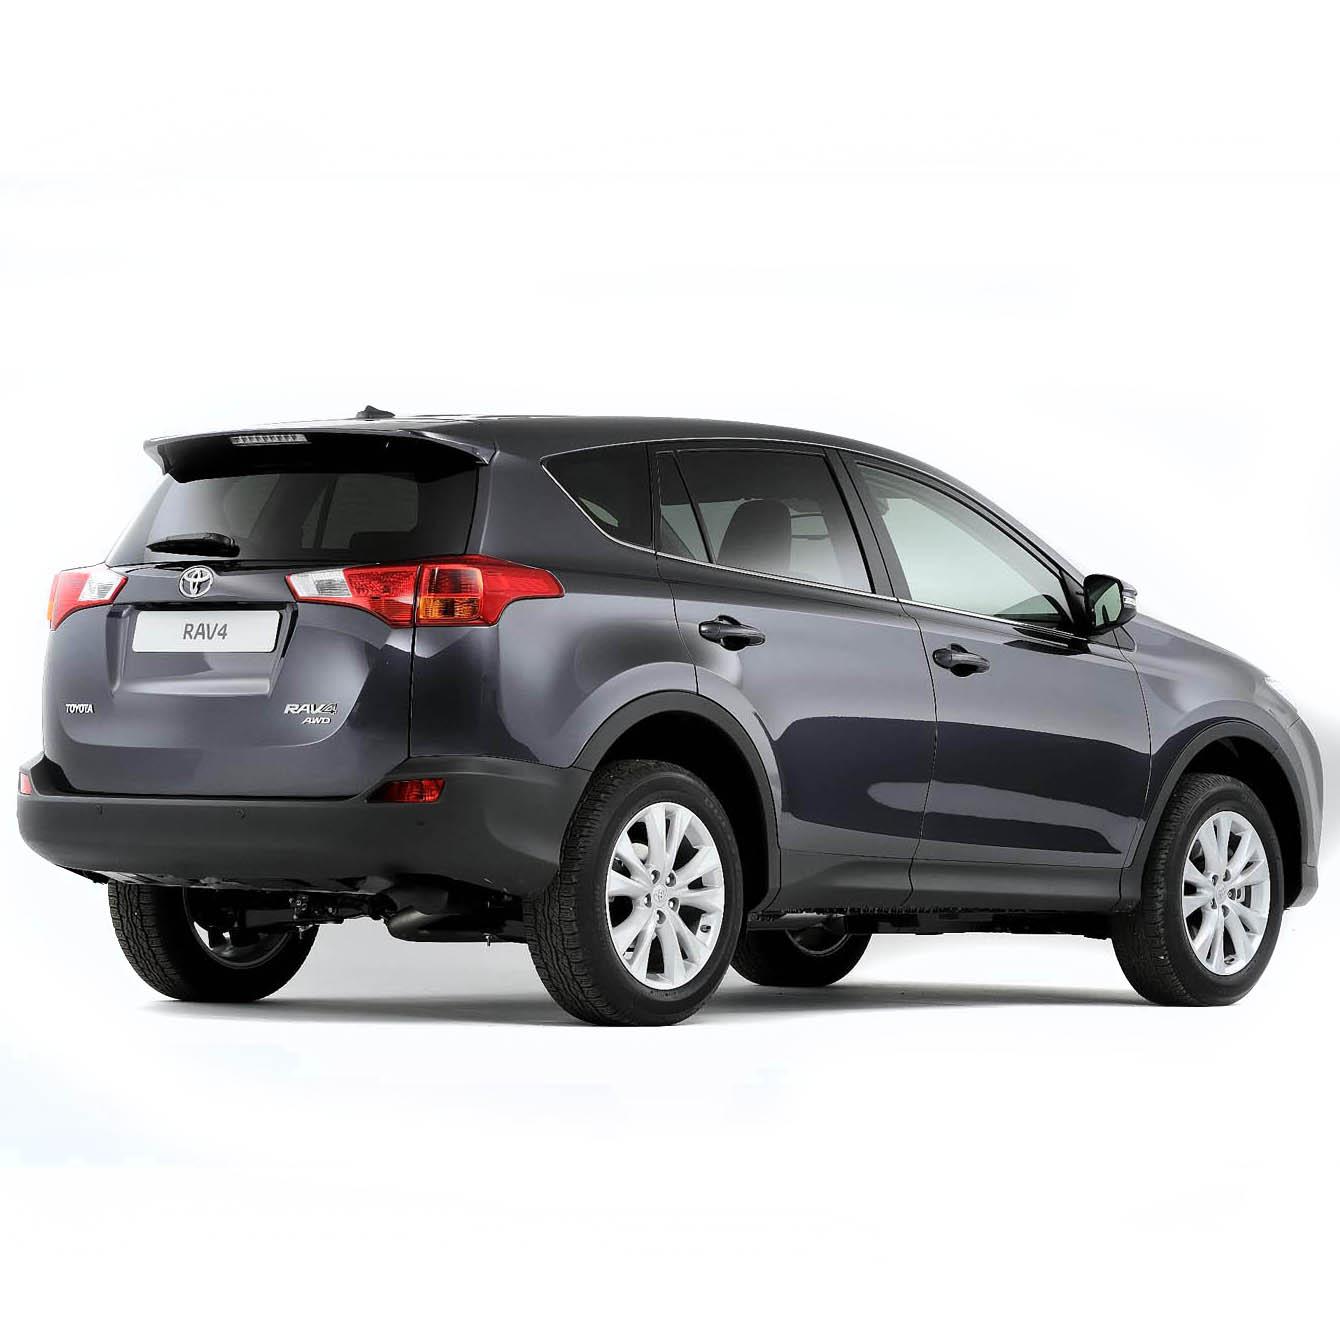 Toyota RAV 4 Boot Liners (2013 - 2018)